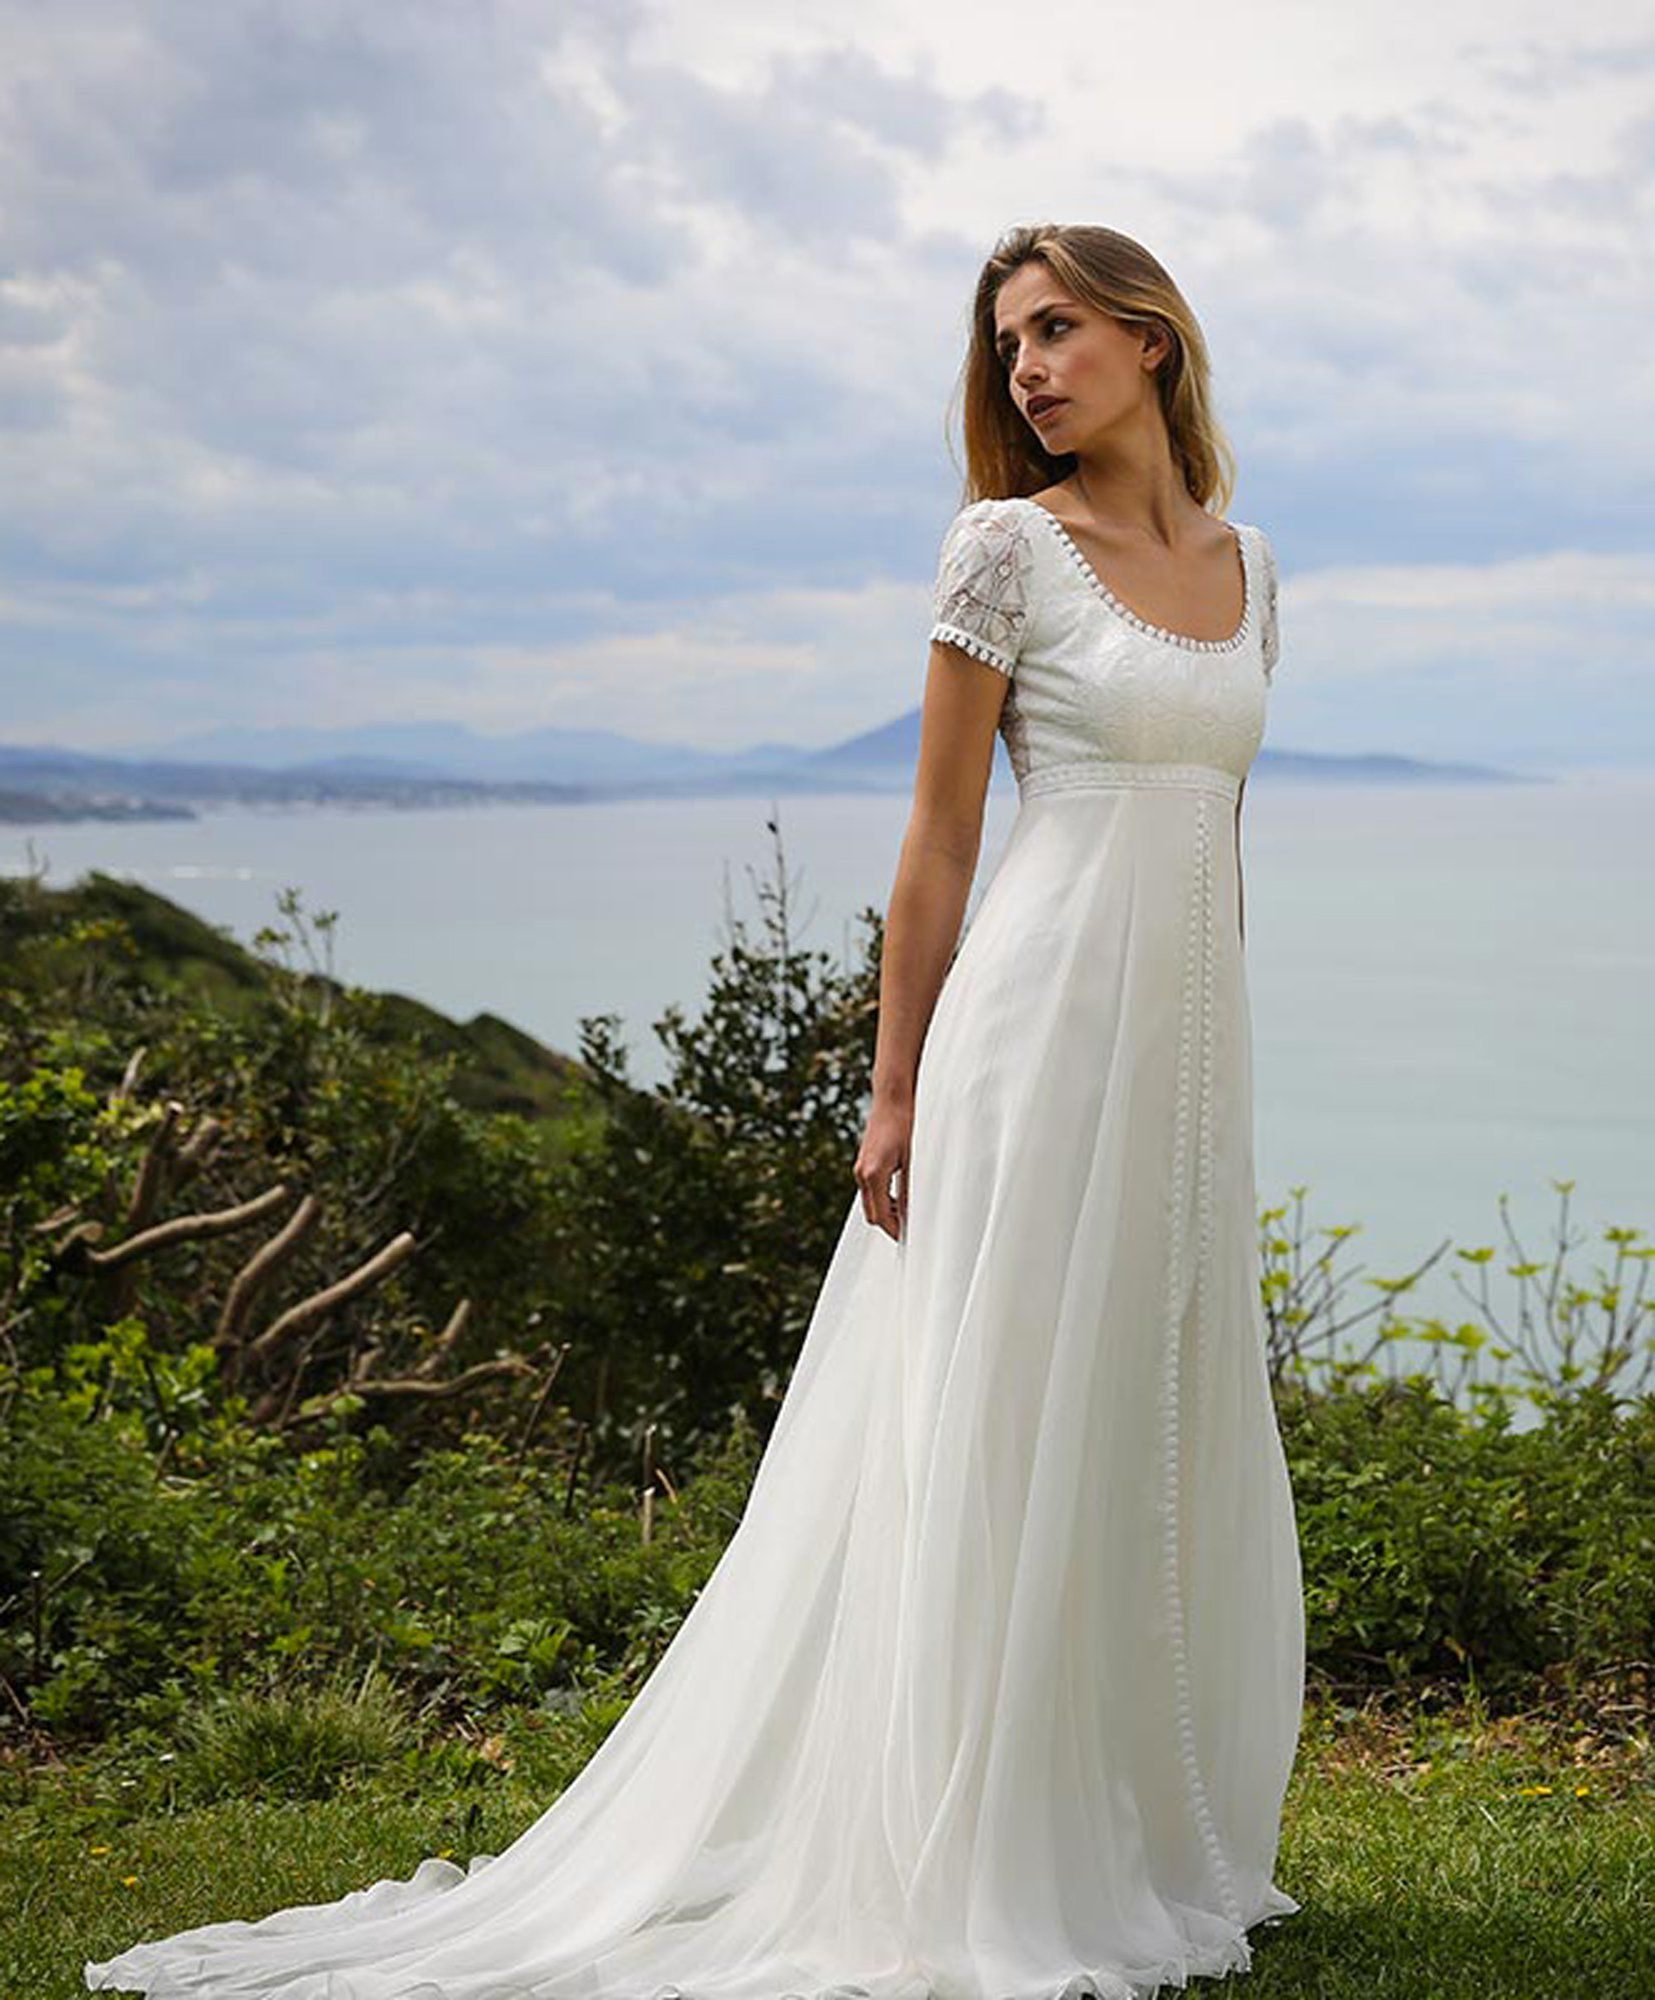 les plus belles robes de mari e 2018 marie laporte prix robe taille empire et robe de mari e 2017. Black Bedroom Furniture Sets. Home Design Ideas